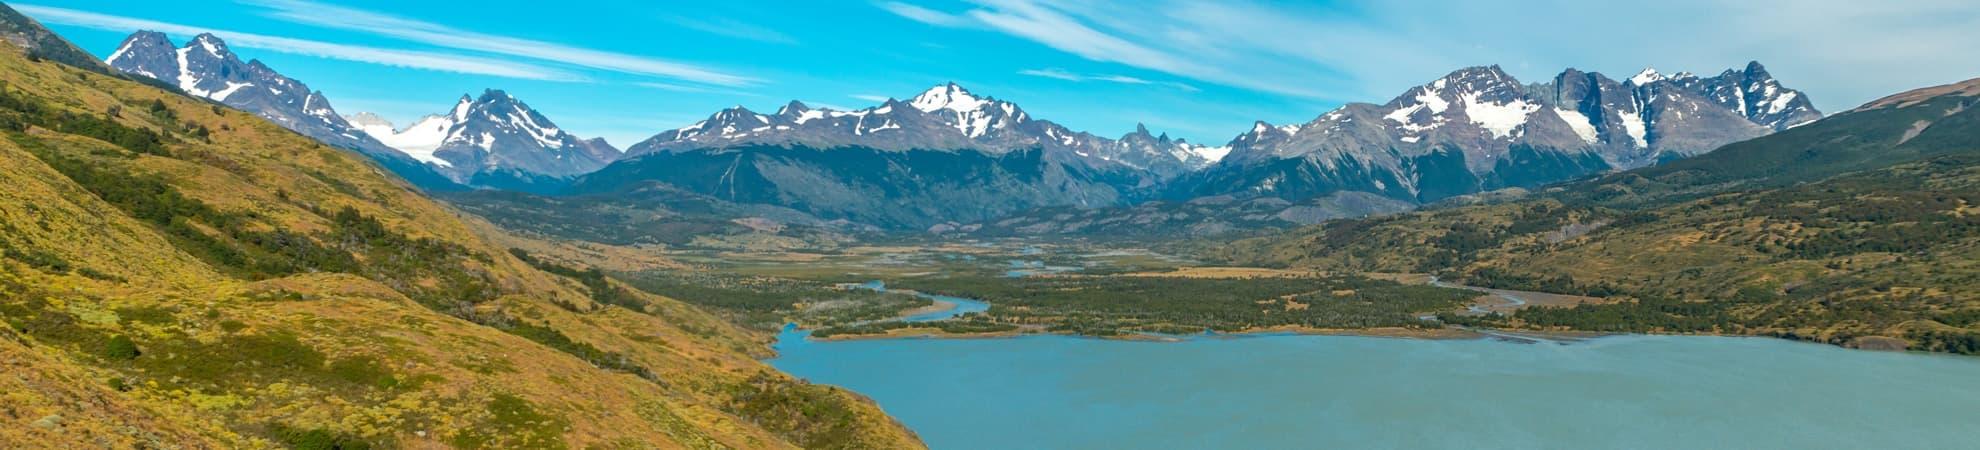 Voyage Torres del Paine